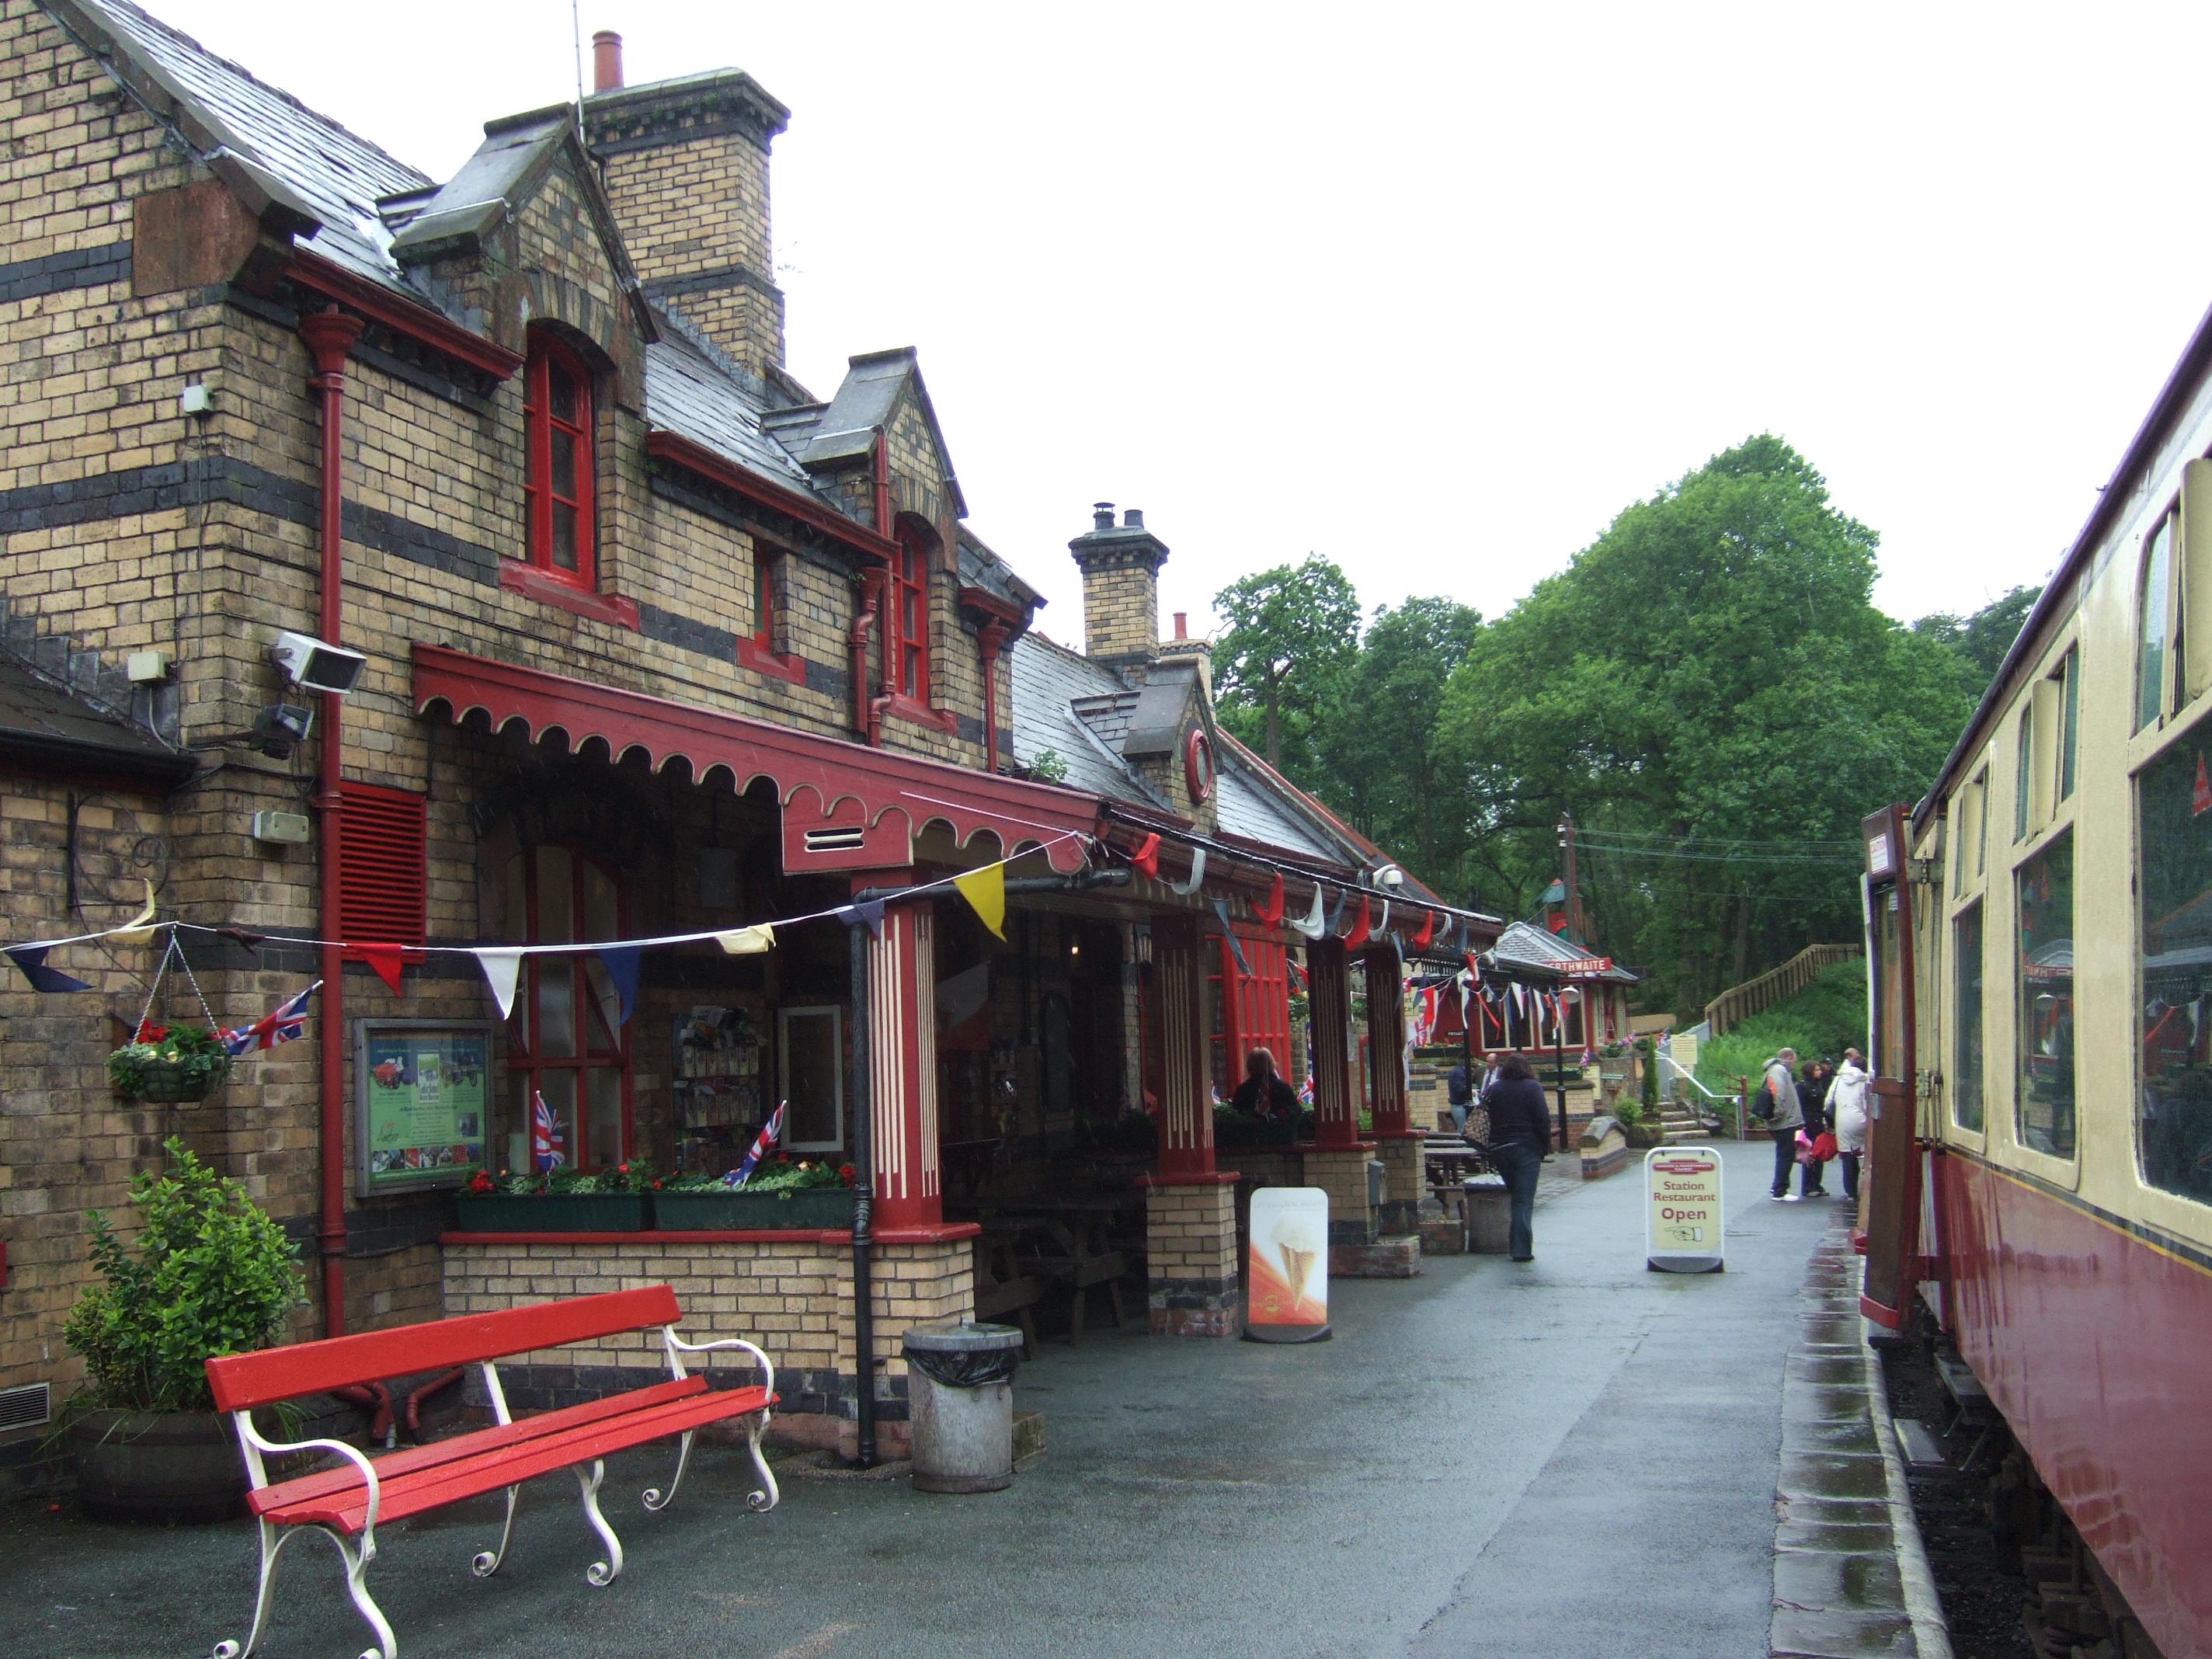 Lakeside and Haverthwaite Steam Railway